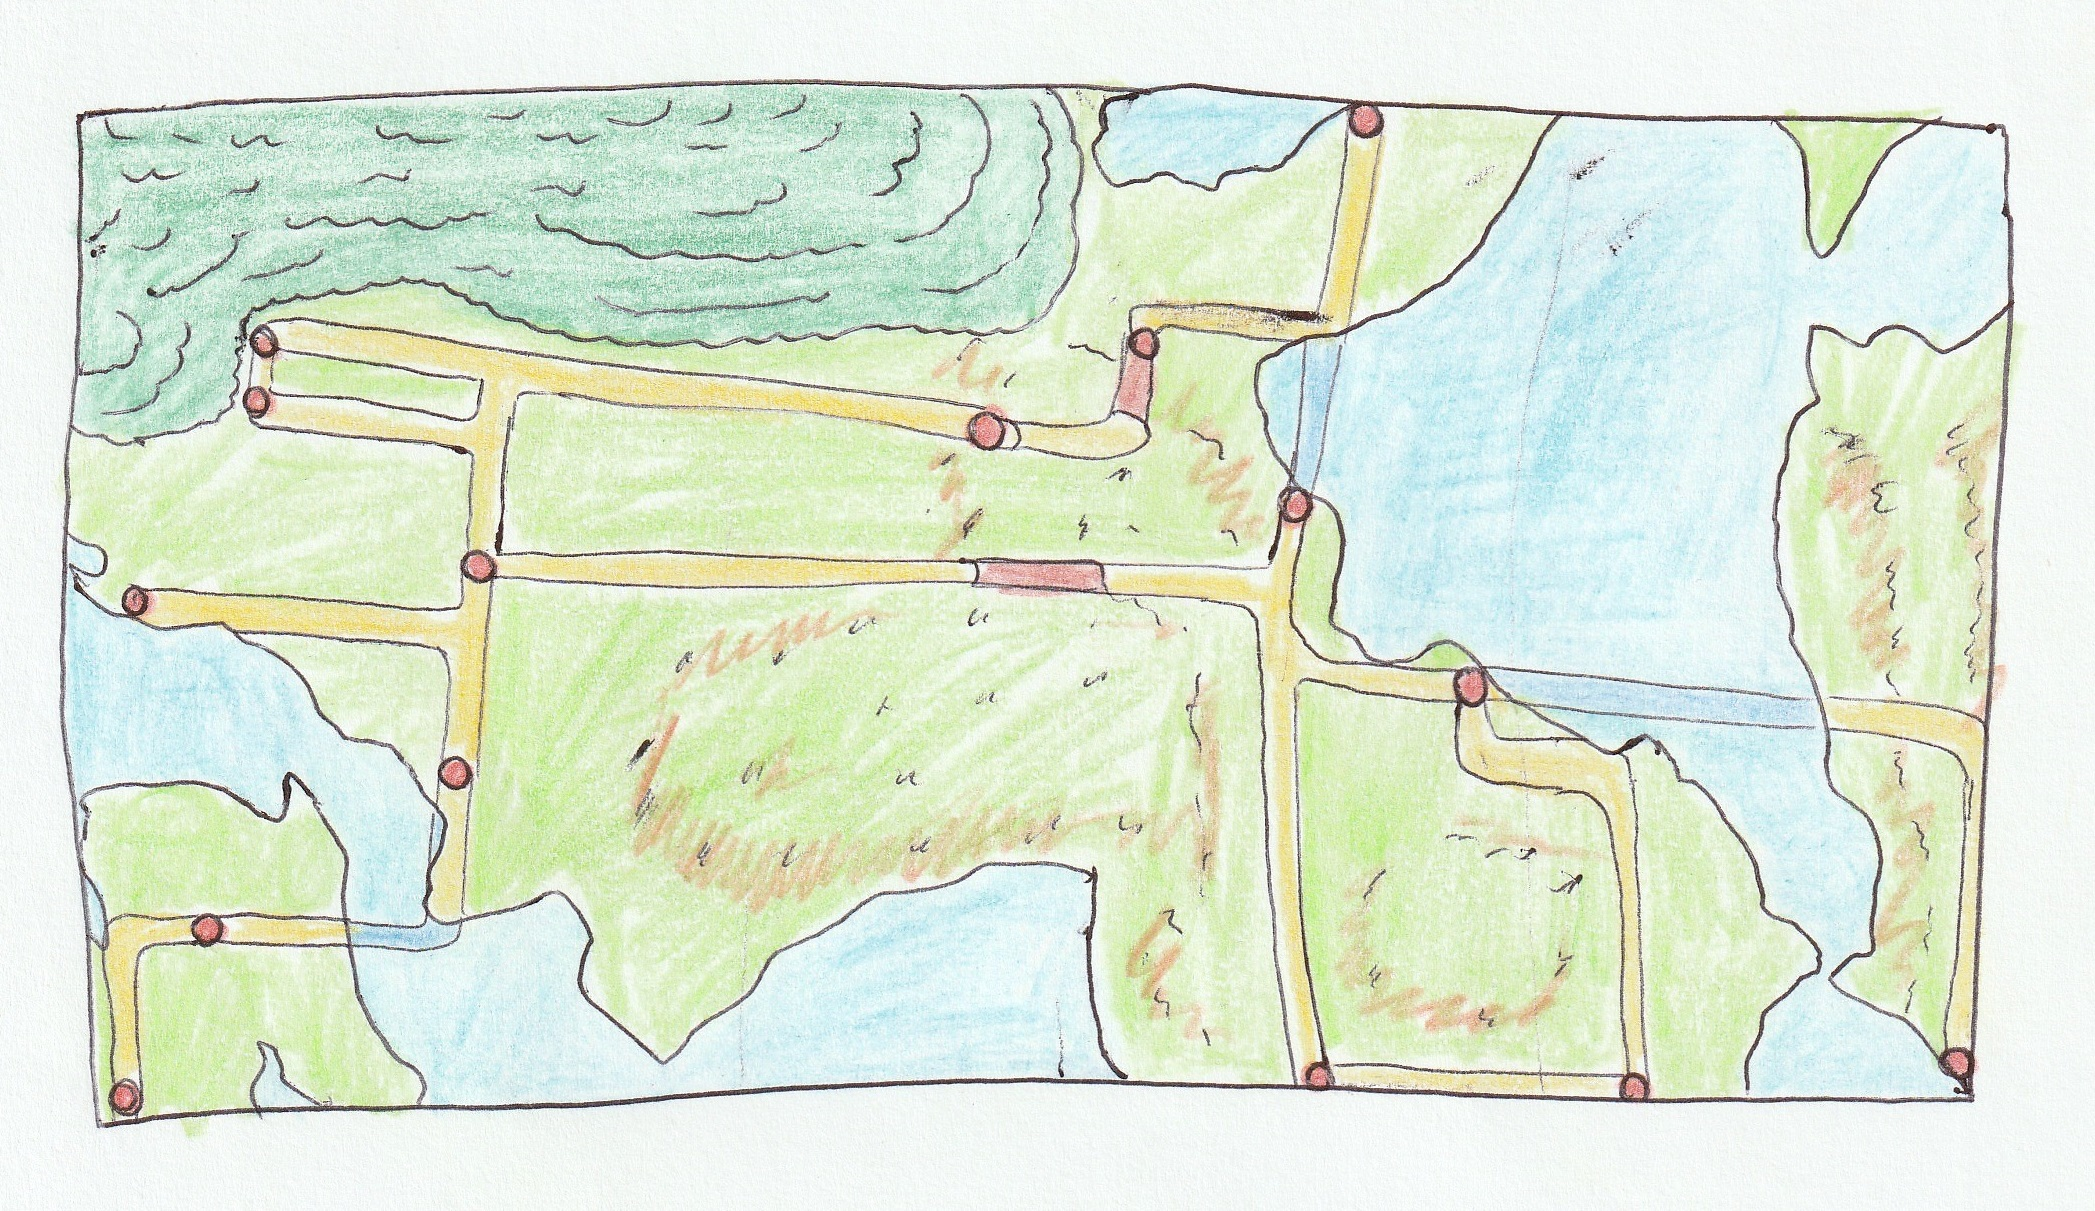 F1/Pokémon crossover game map design